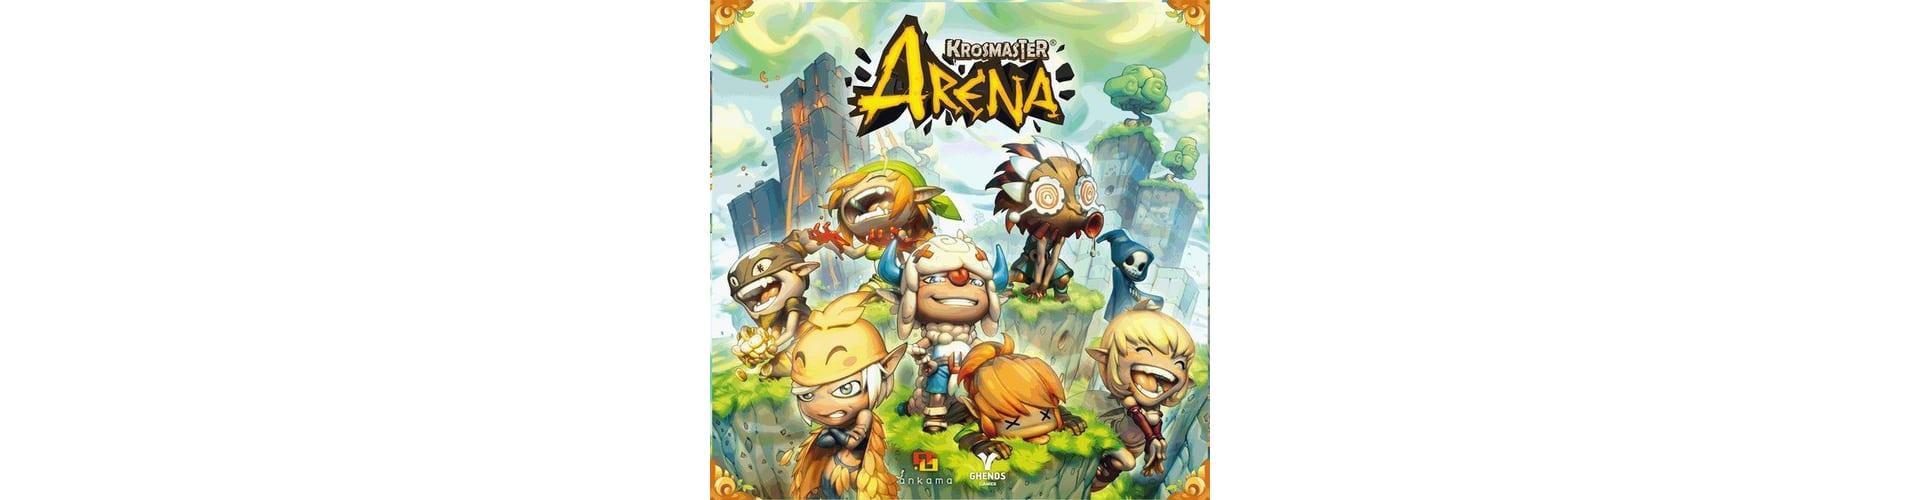 Krosmaster: Arena обзор игры